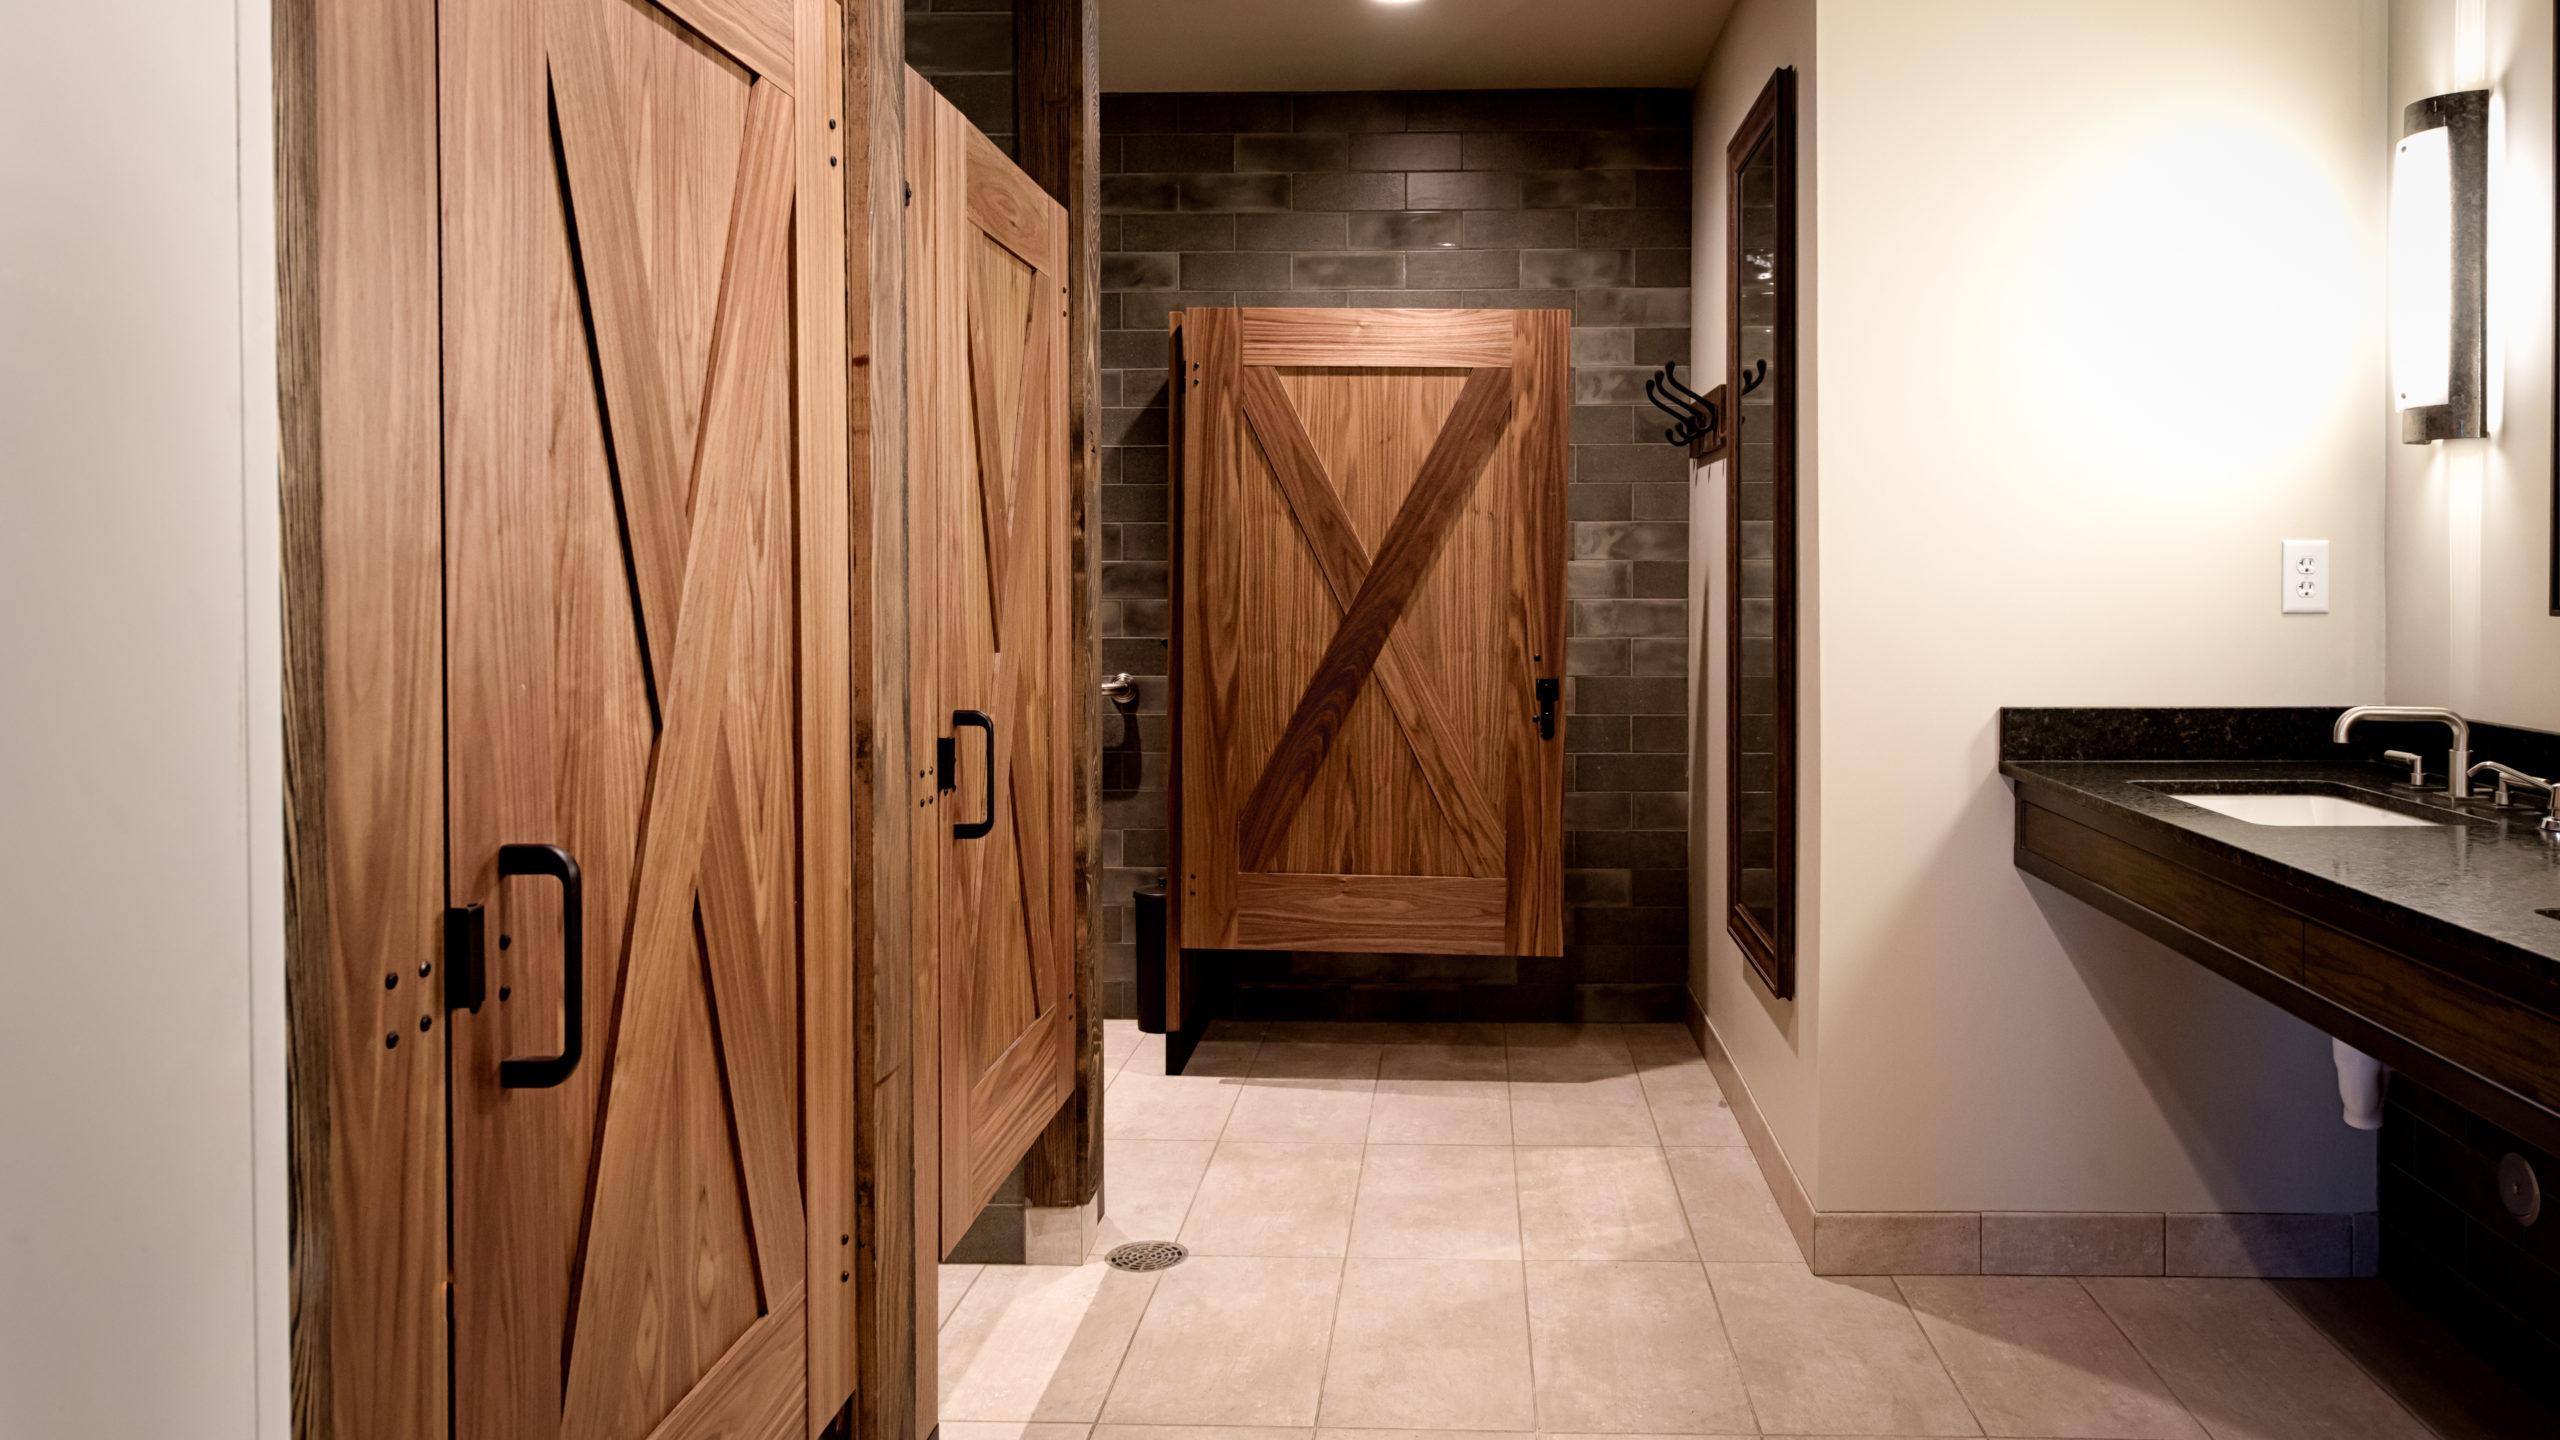 Luxury Montana lodge bathroom displaying three wood veneer captured panel doors with large X shape on both sides of doors in dark subway tiled room.